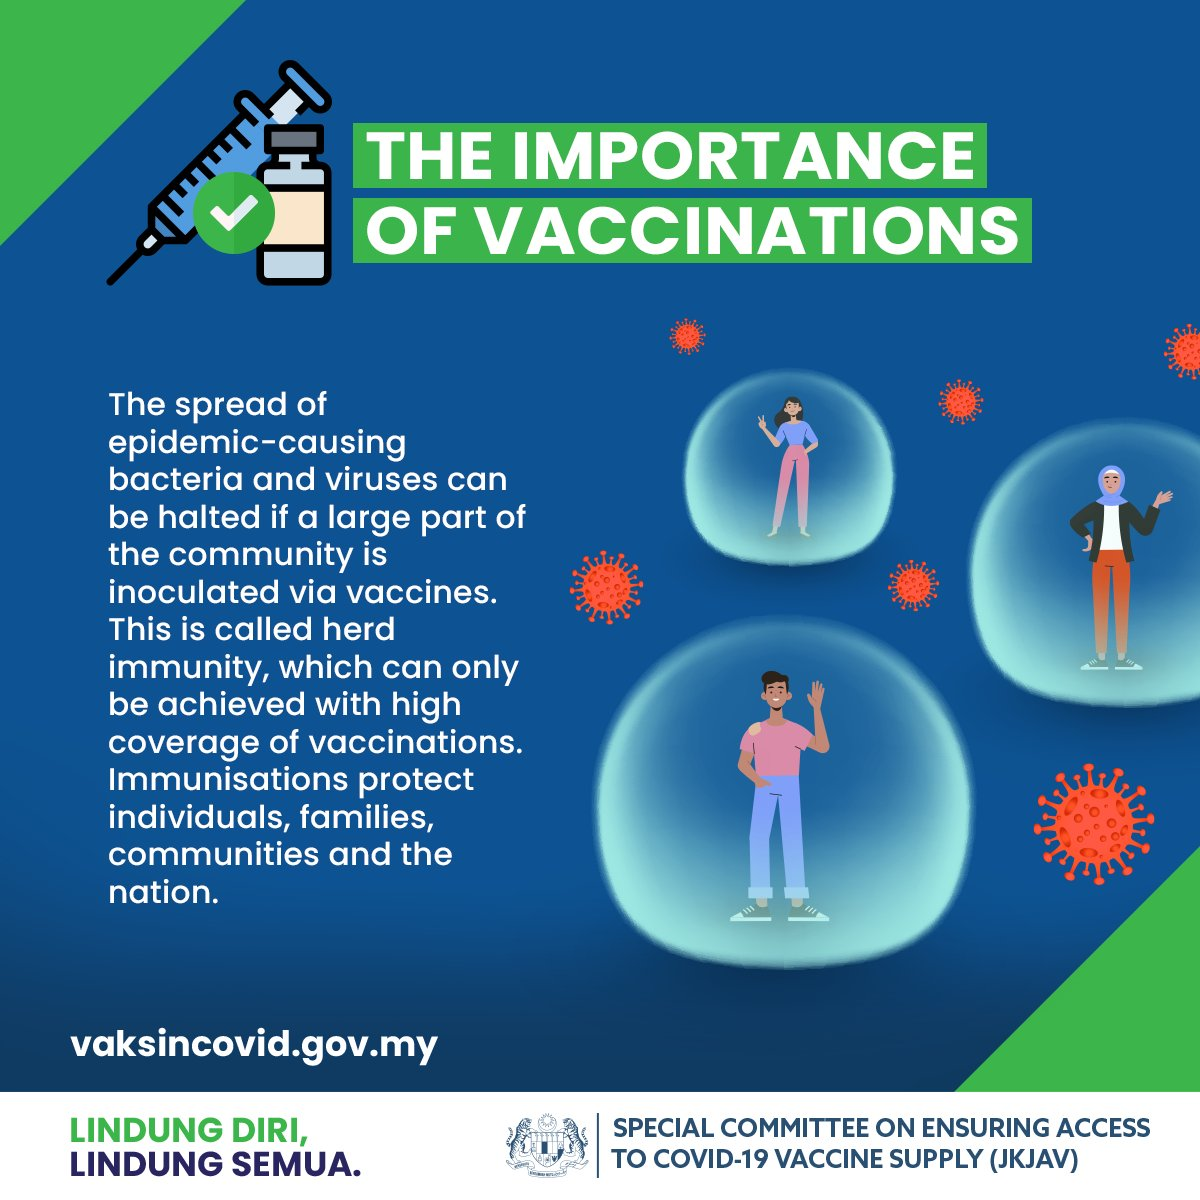 Let's get the vaccine!  #LindungDiriLindungSemua